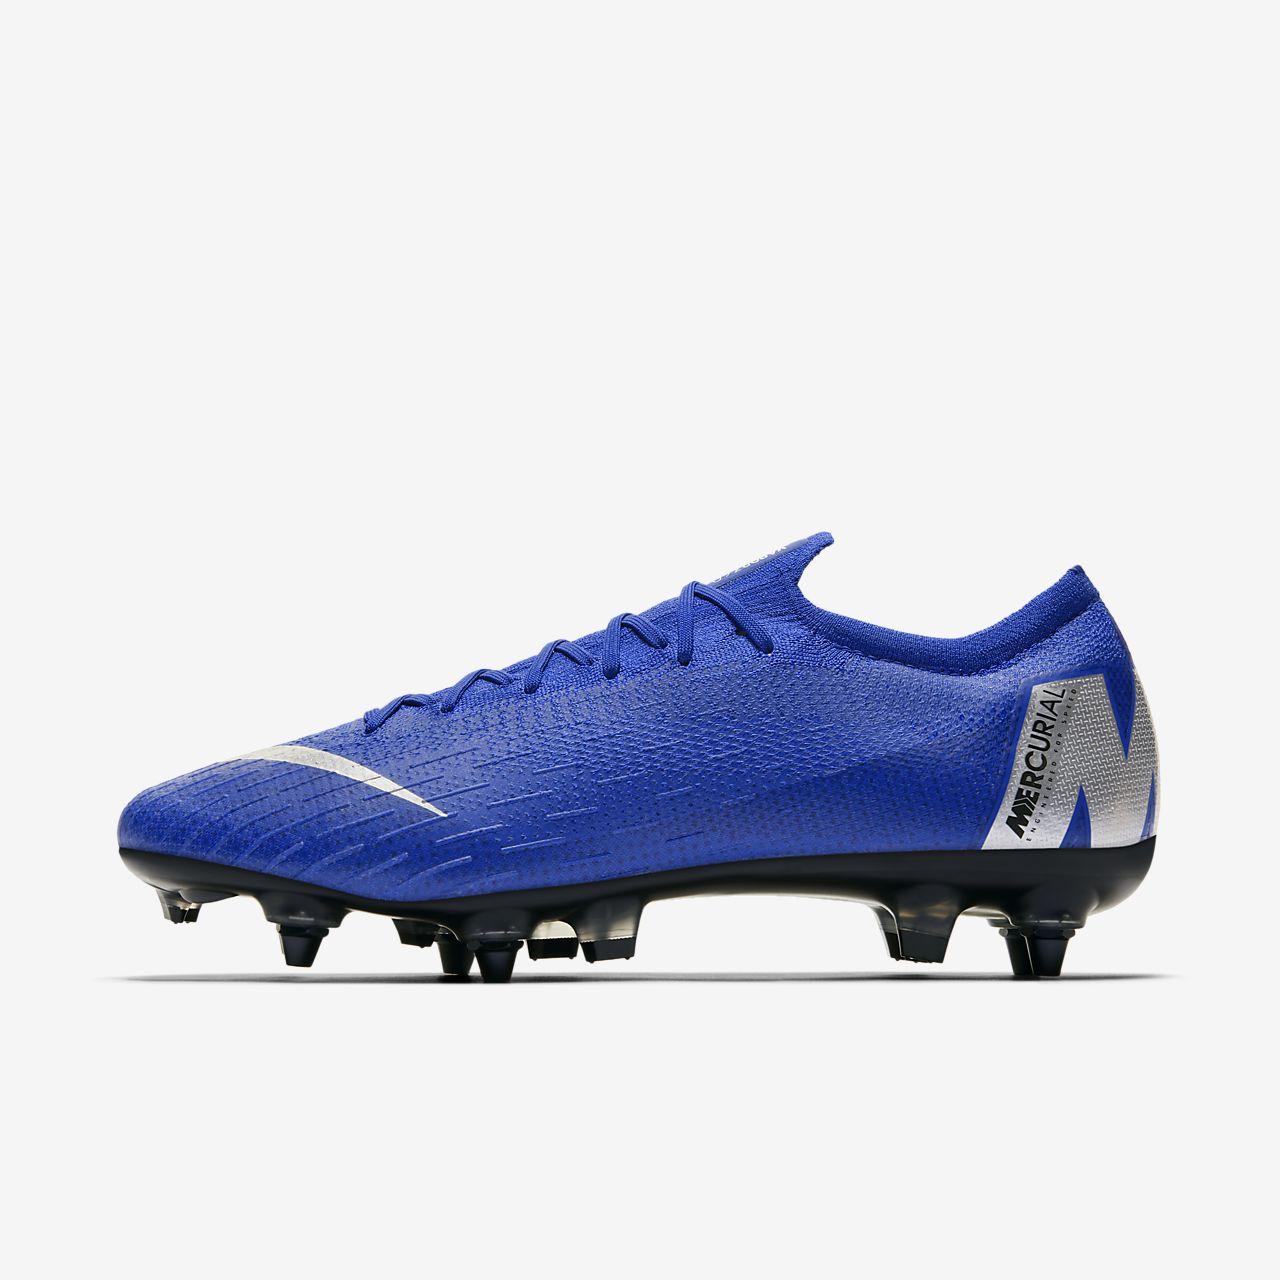 Football À Terrain Chaussure Crampons De Nike Mercurial Pour Gras xxnw5P